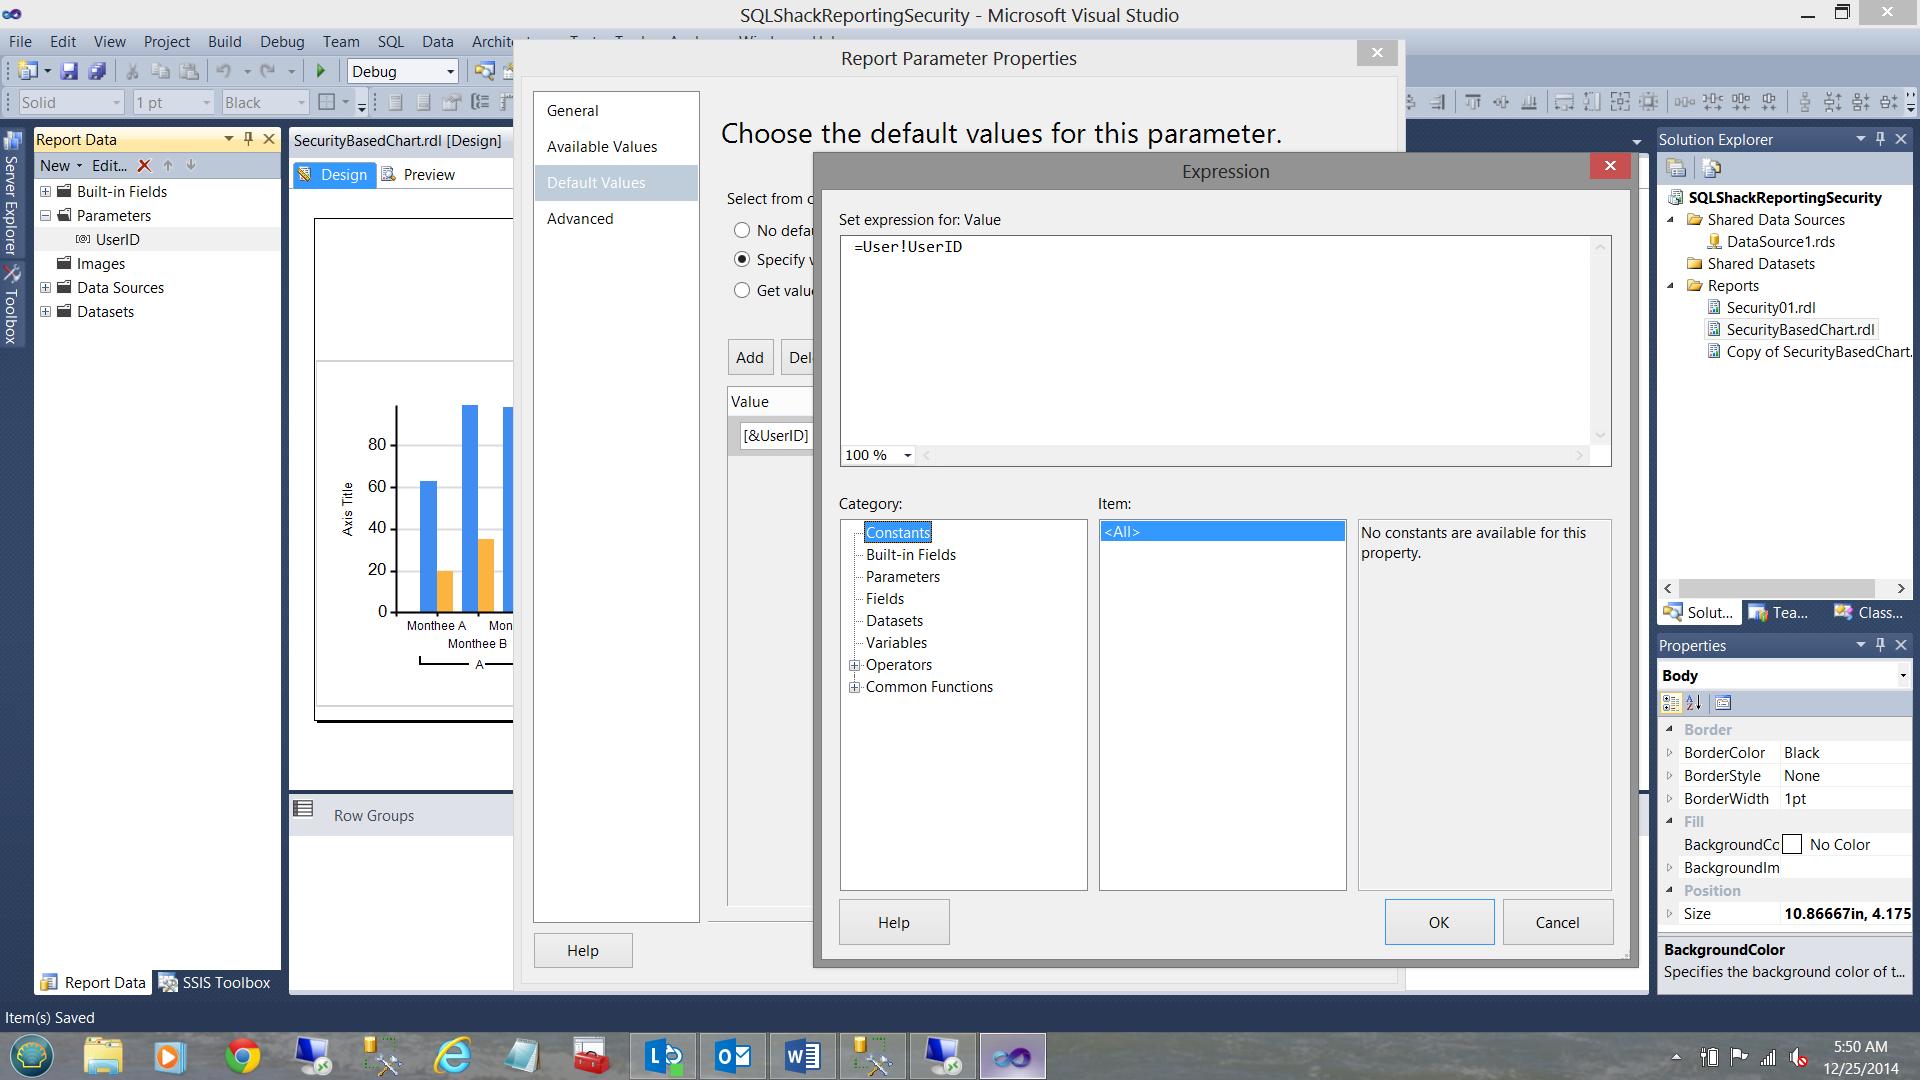 SQL Server安全机制–如何控制用户能够在报告中查看哪些数据30